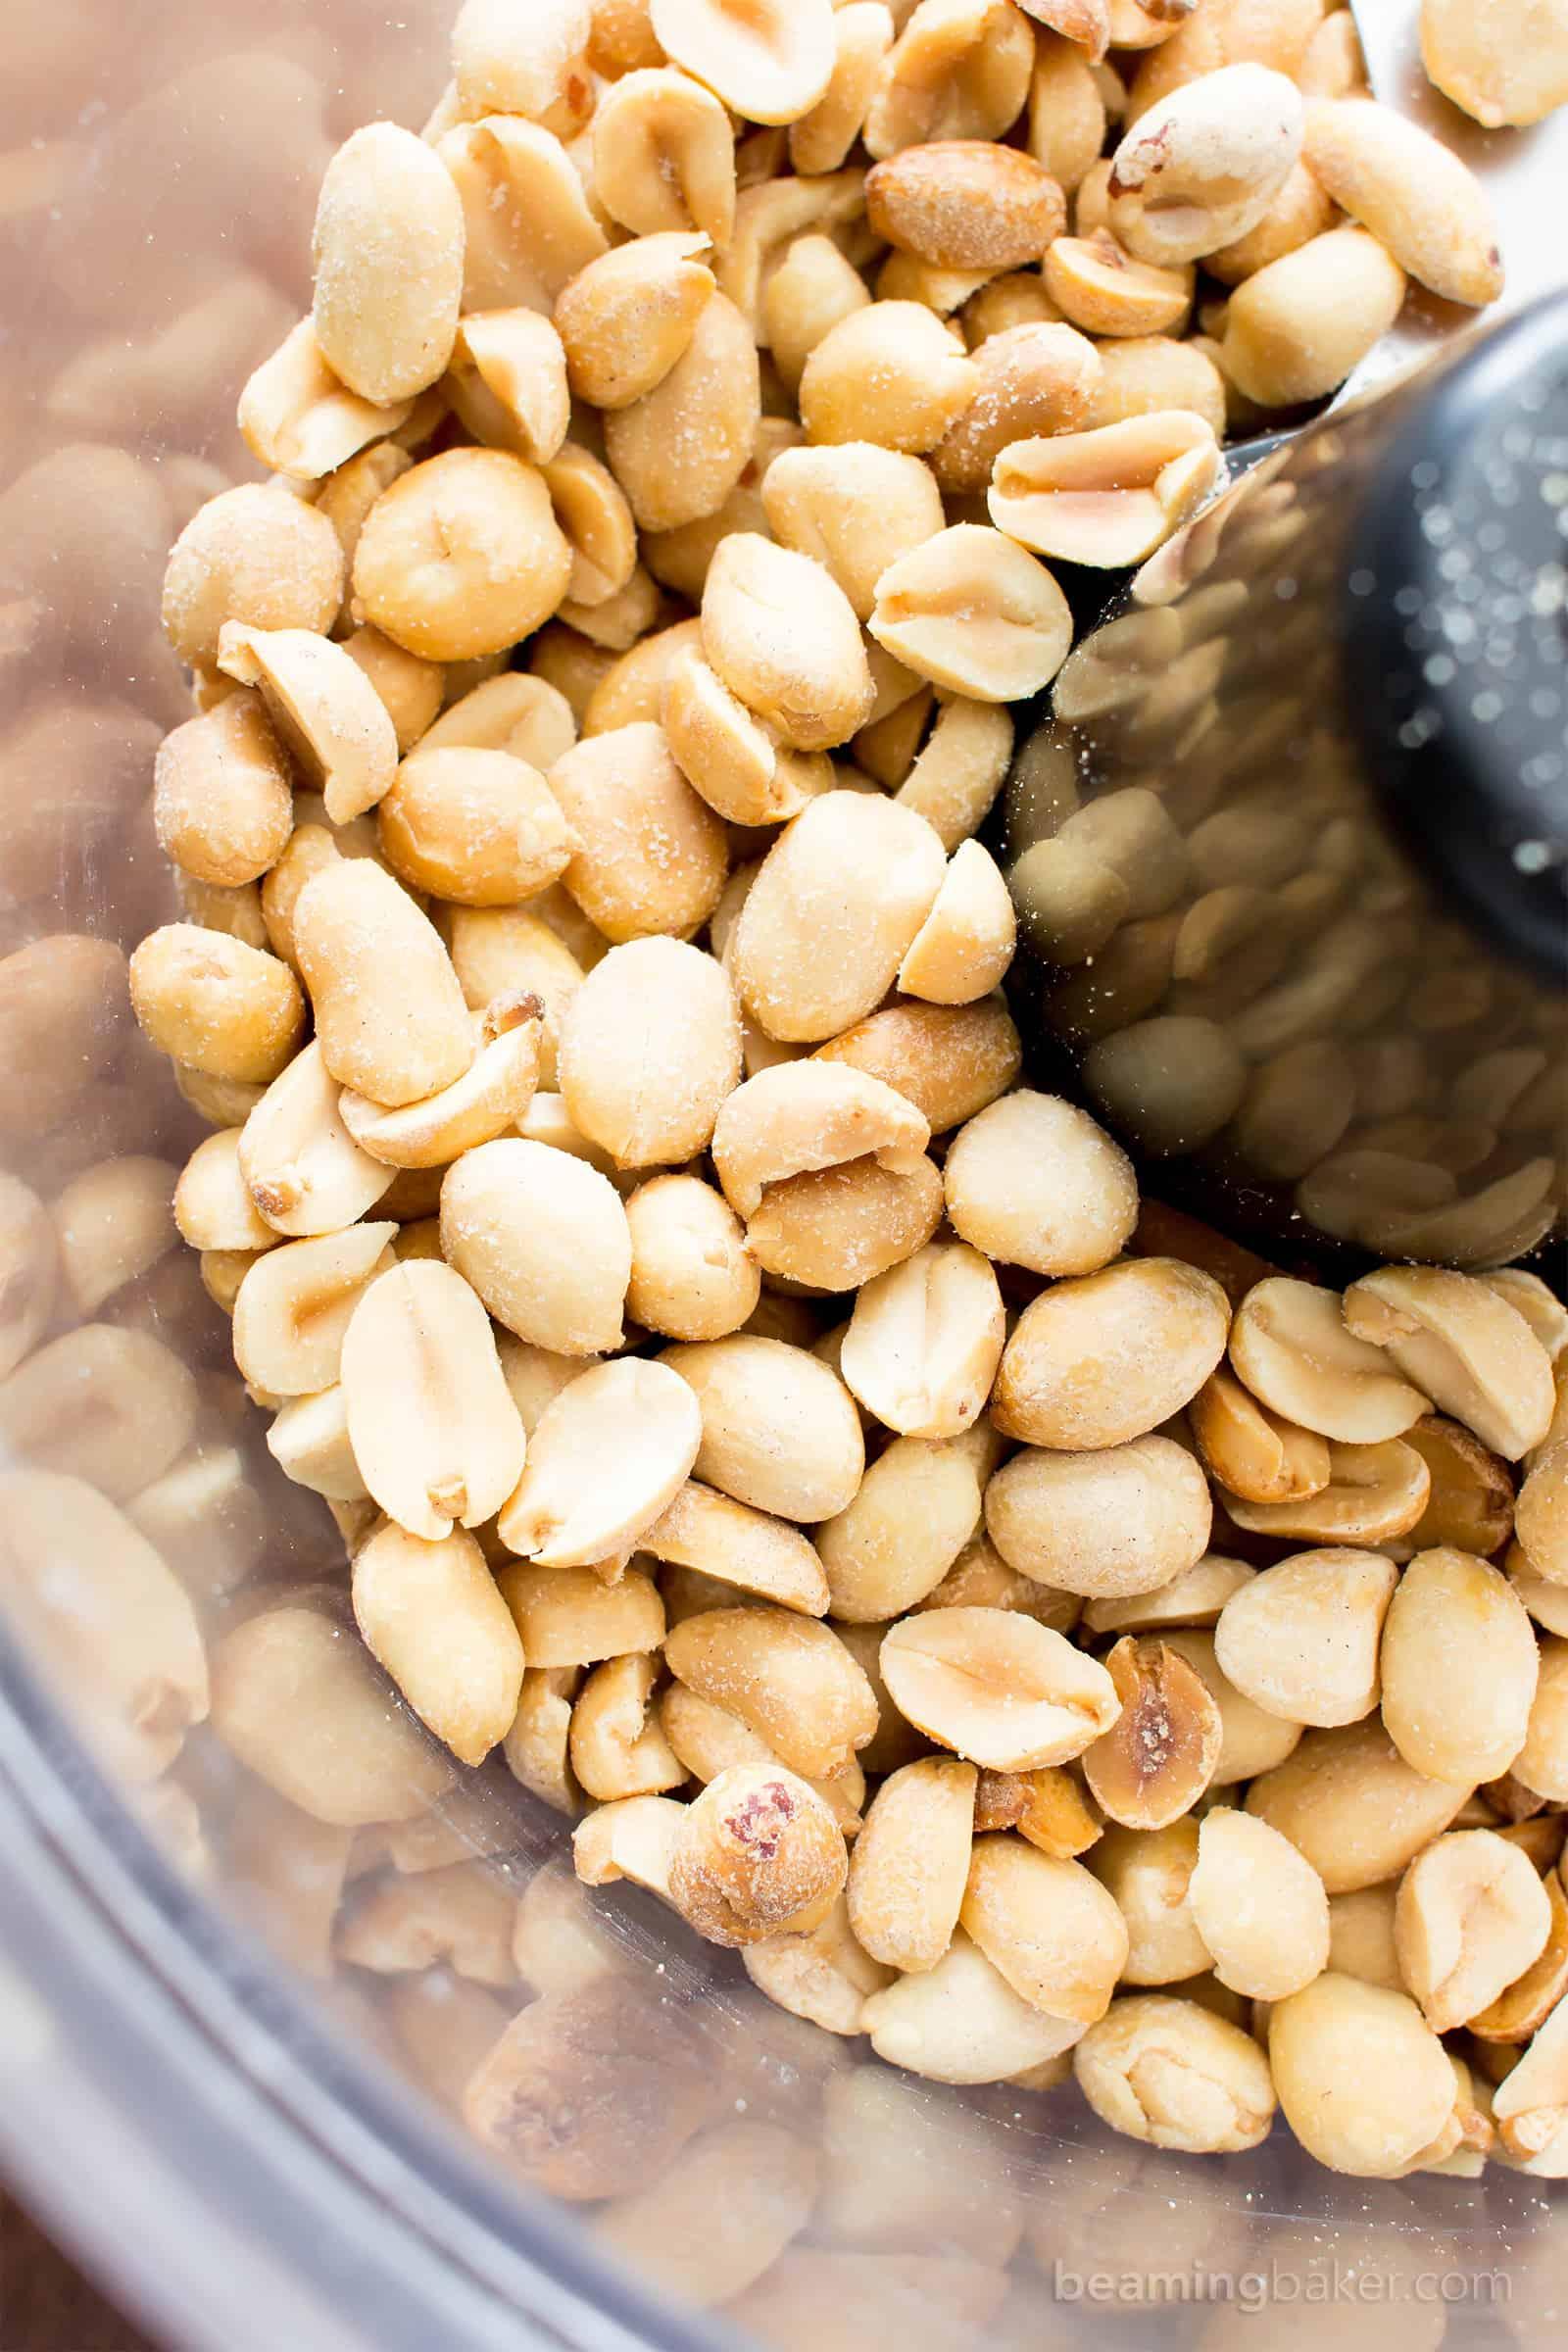 Peanut Butter Food Processor No Oil